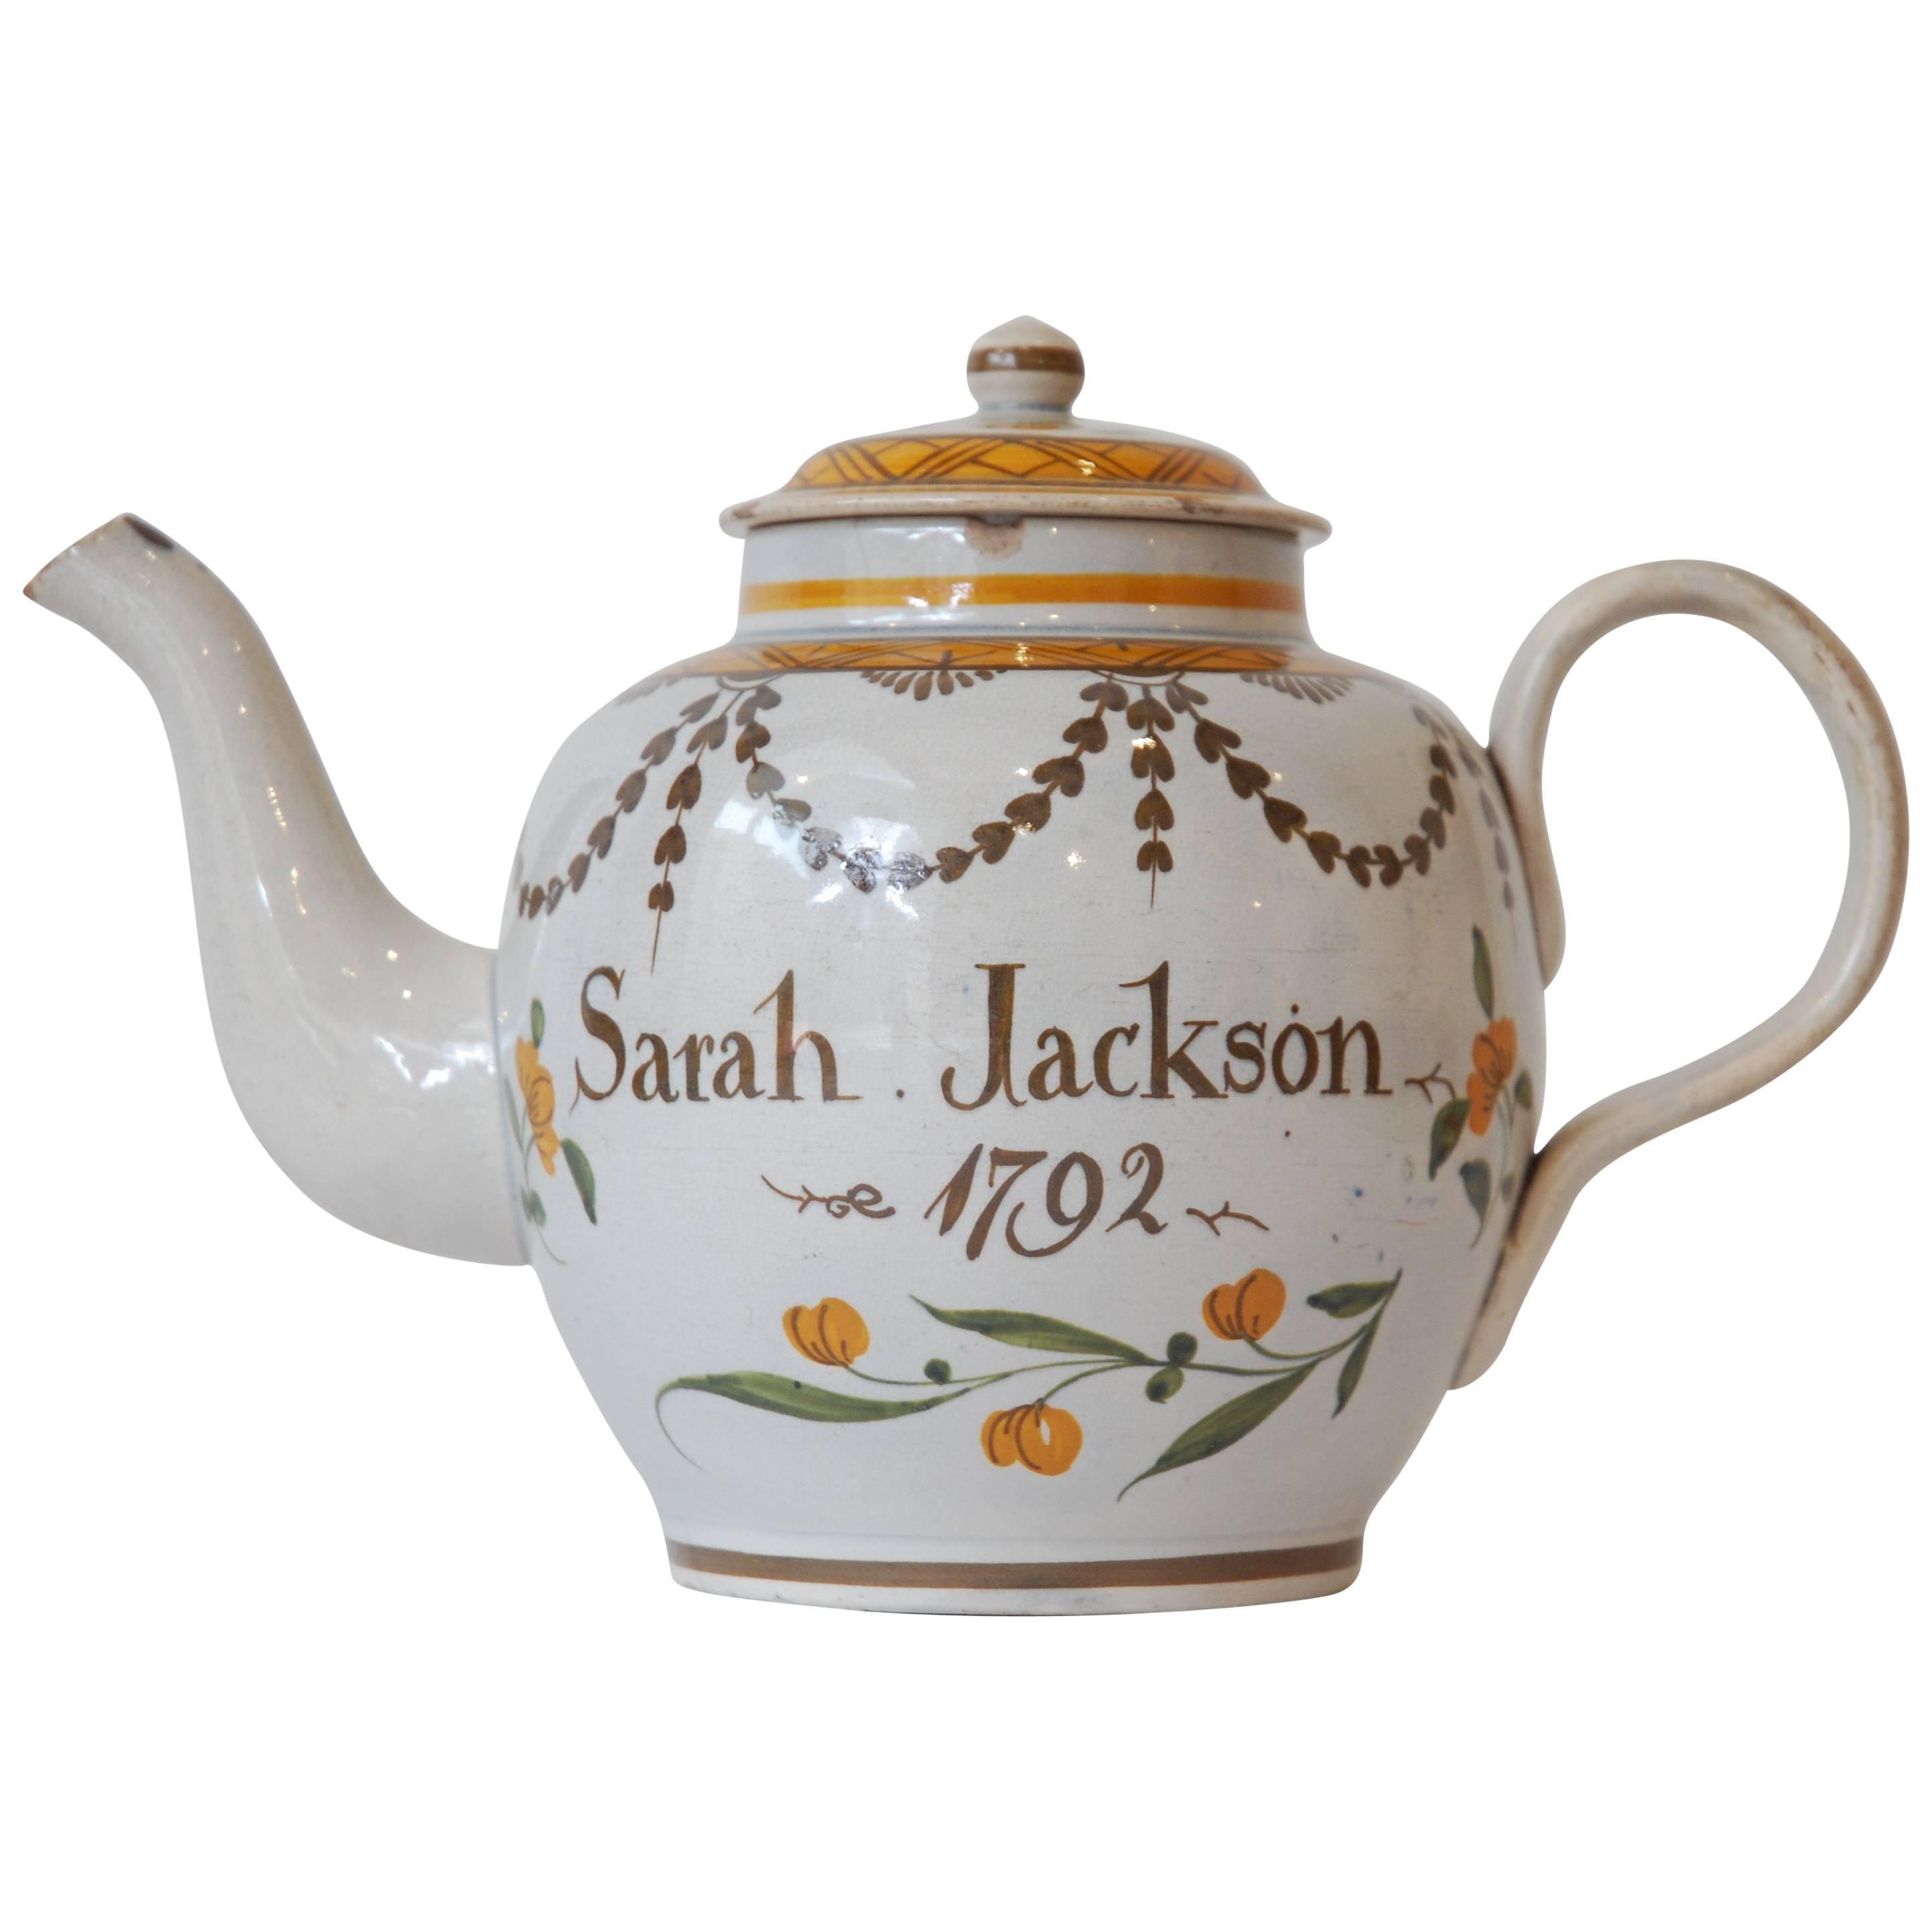 Prattware Teapot, Dated 1792